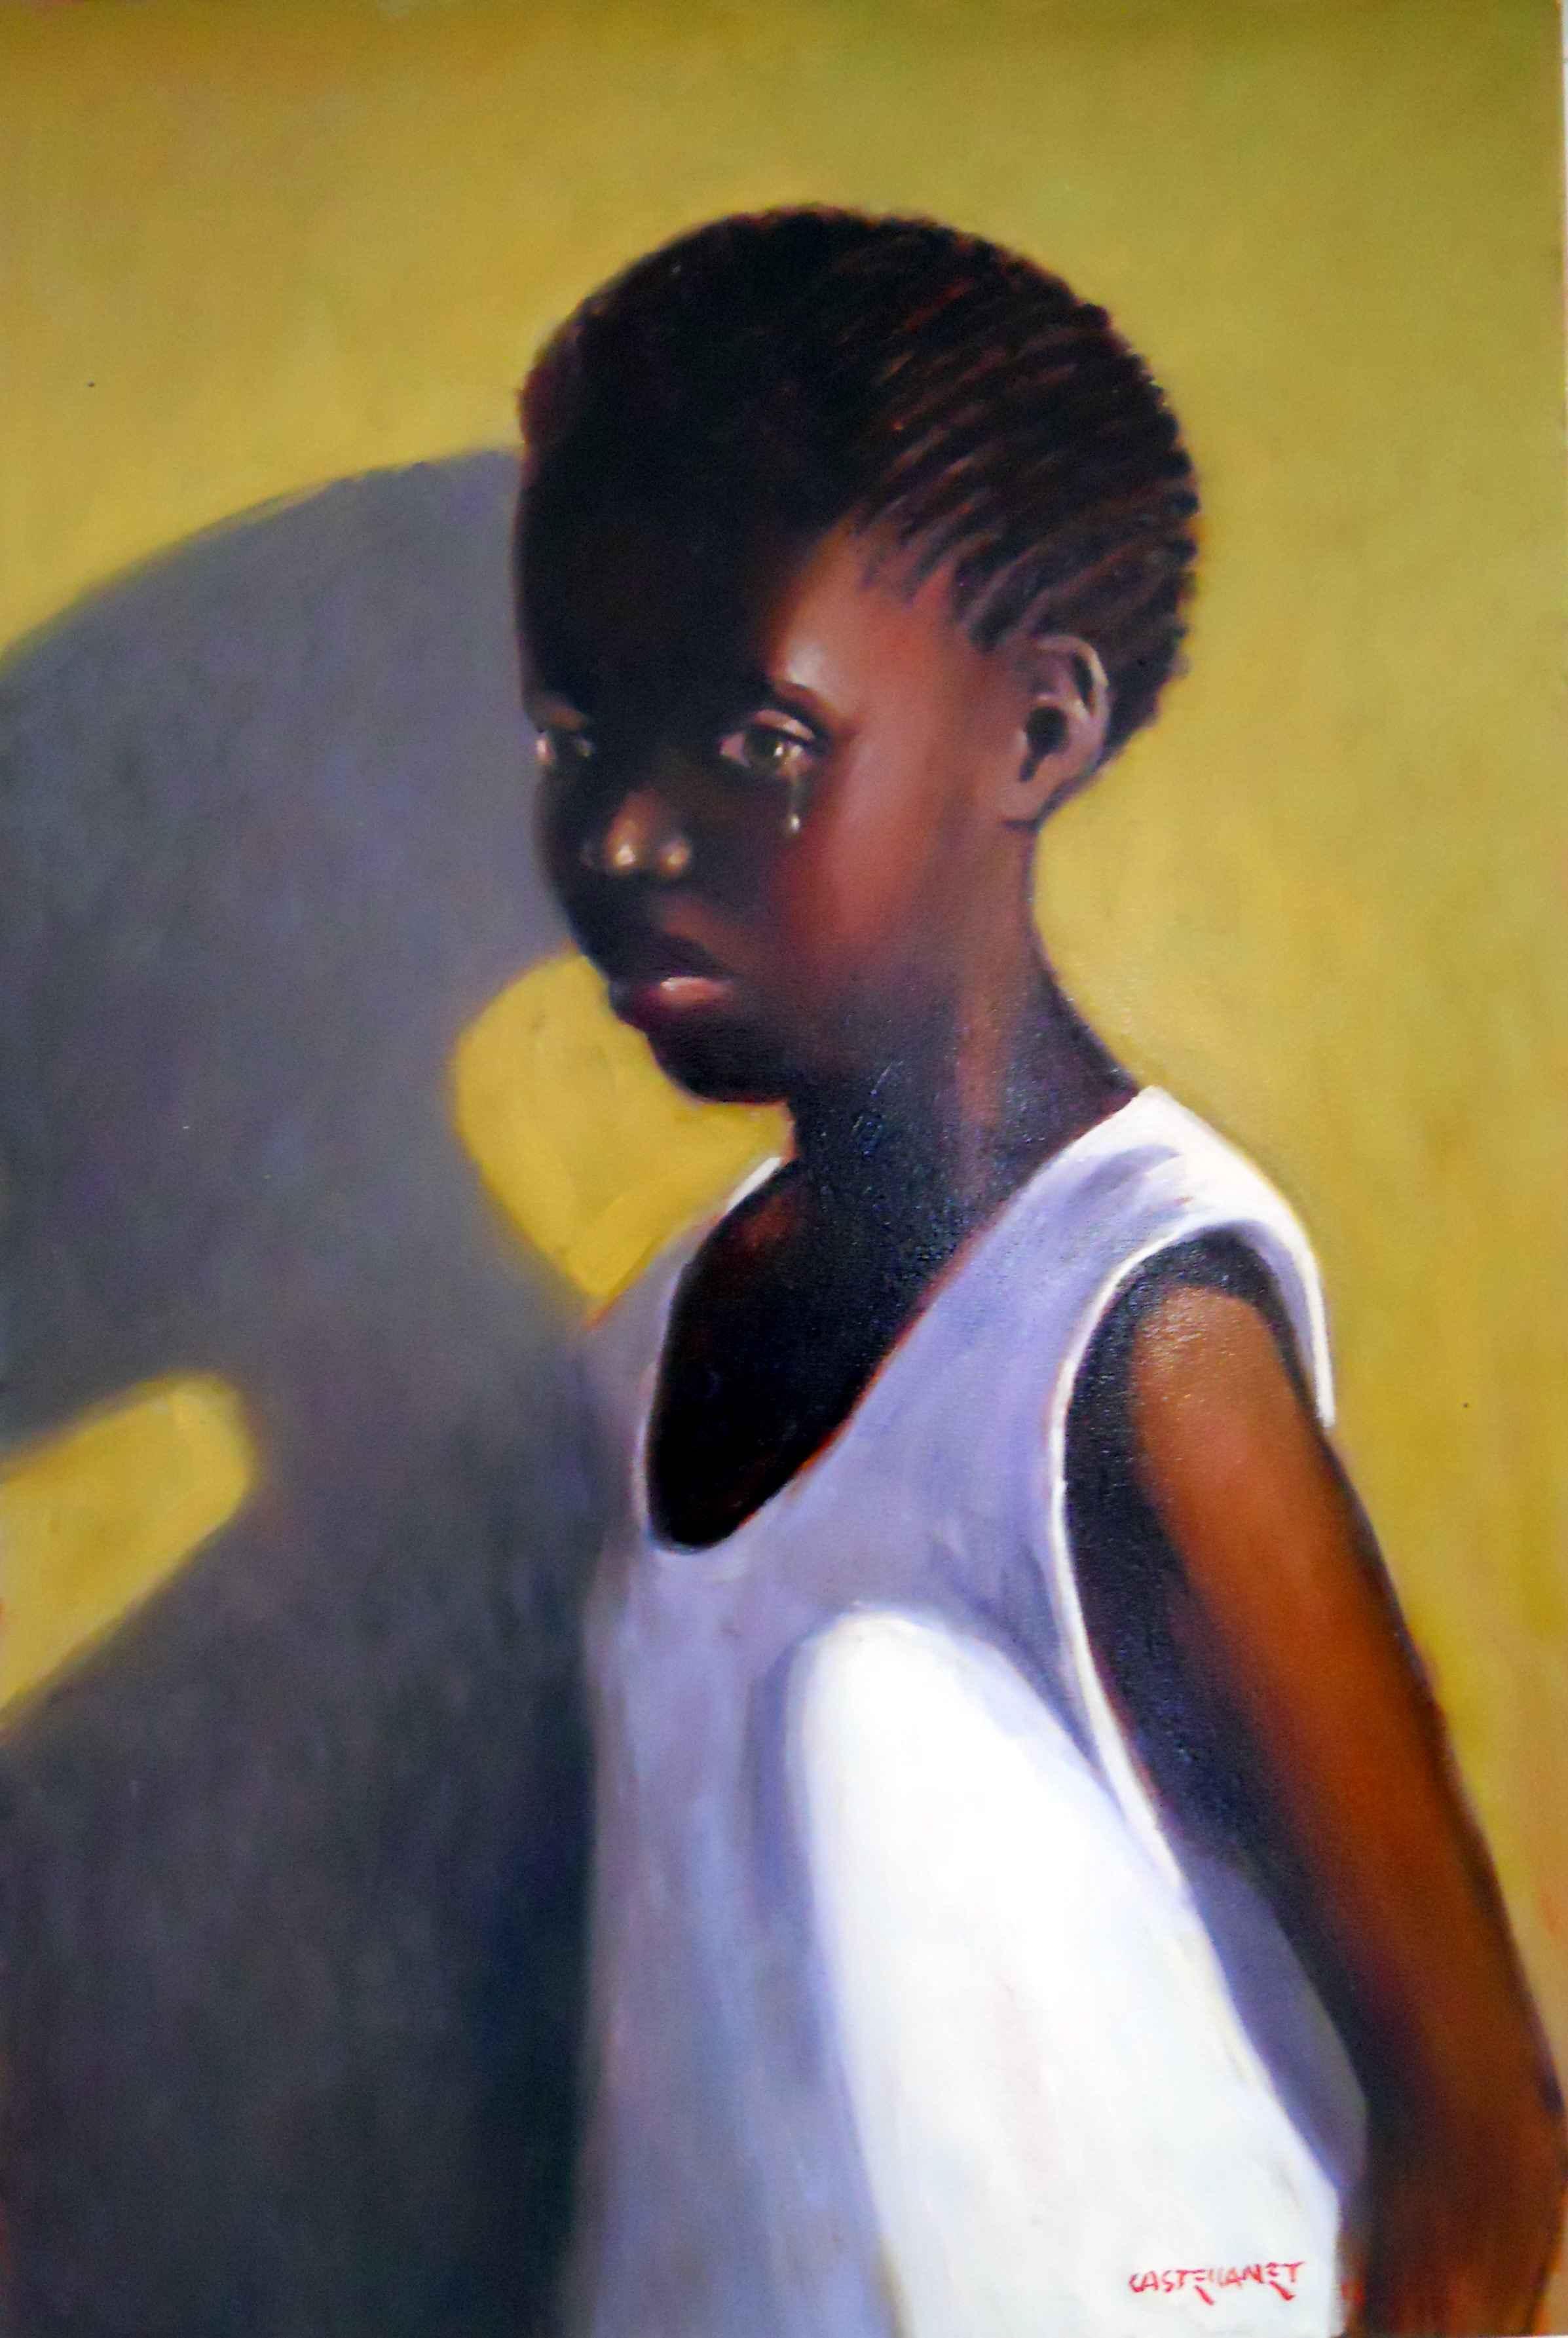 The Teardrop * by Mr. Vincent Castellanet - Masterpiece Online